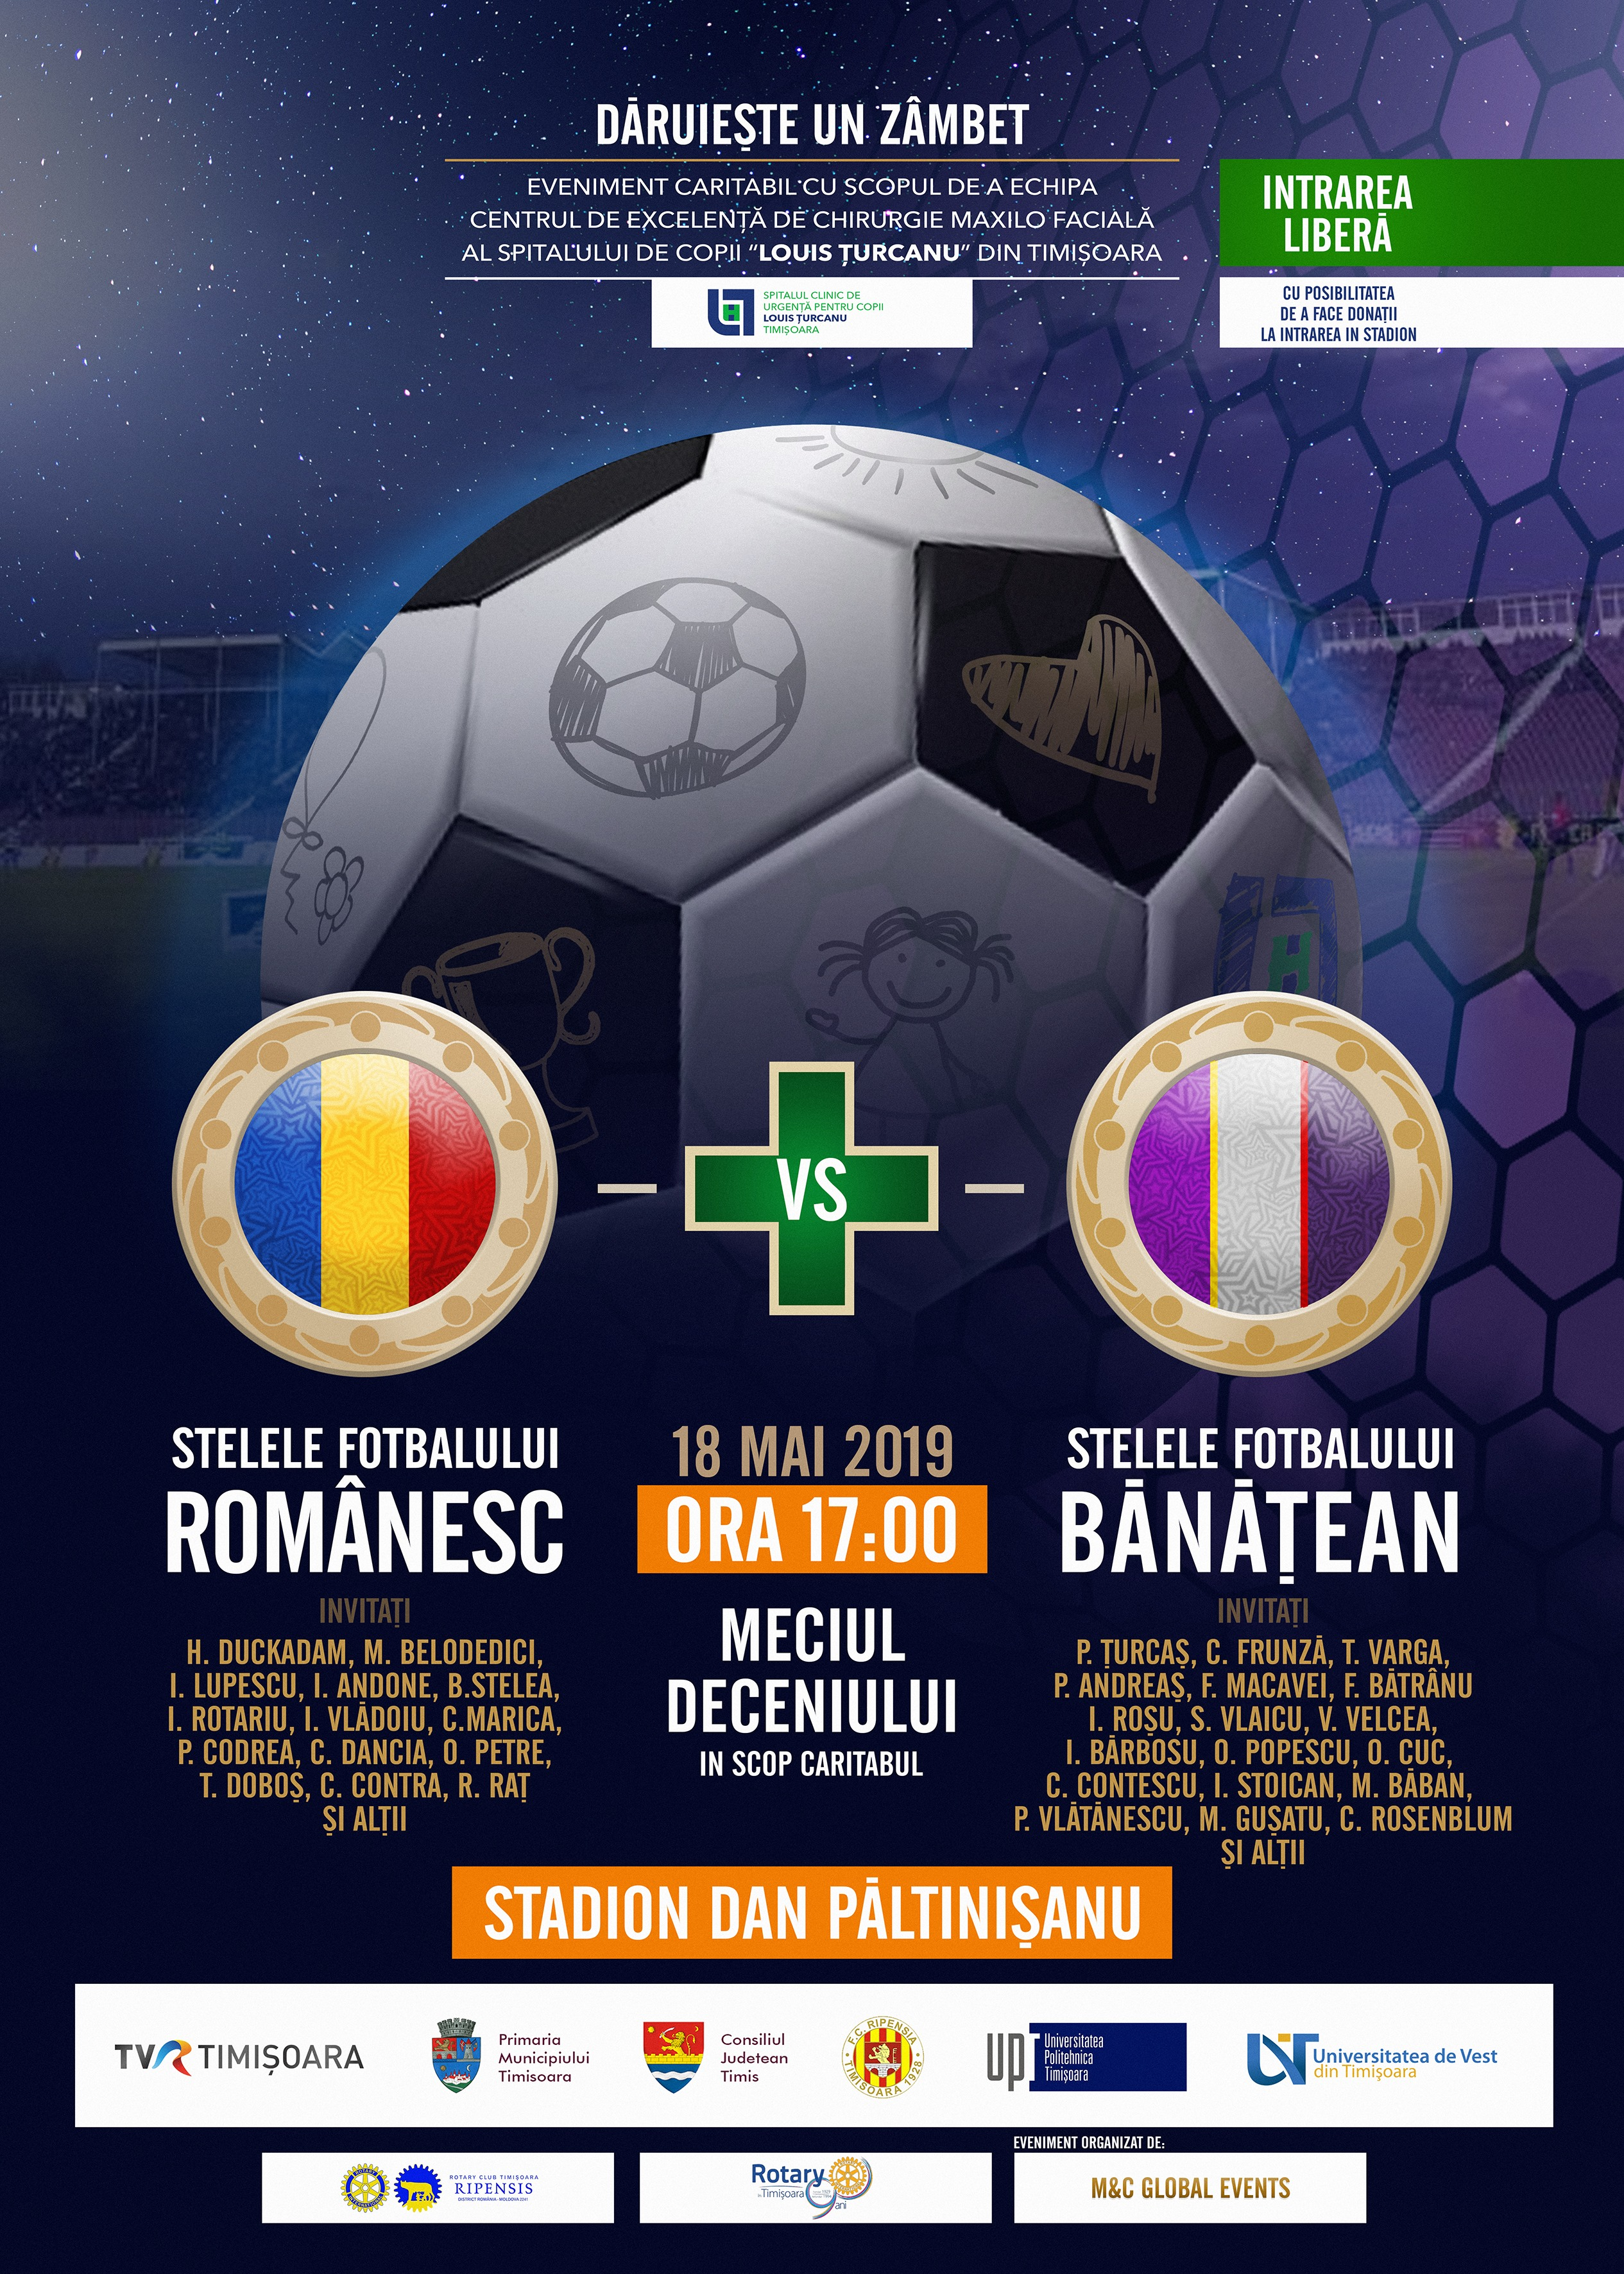 Meci de fotbal caritabil la Timișoara